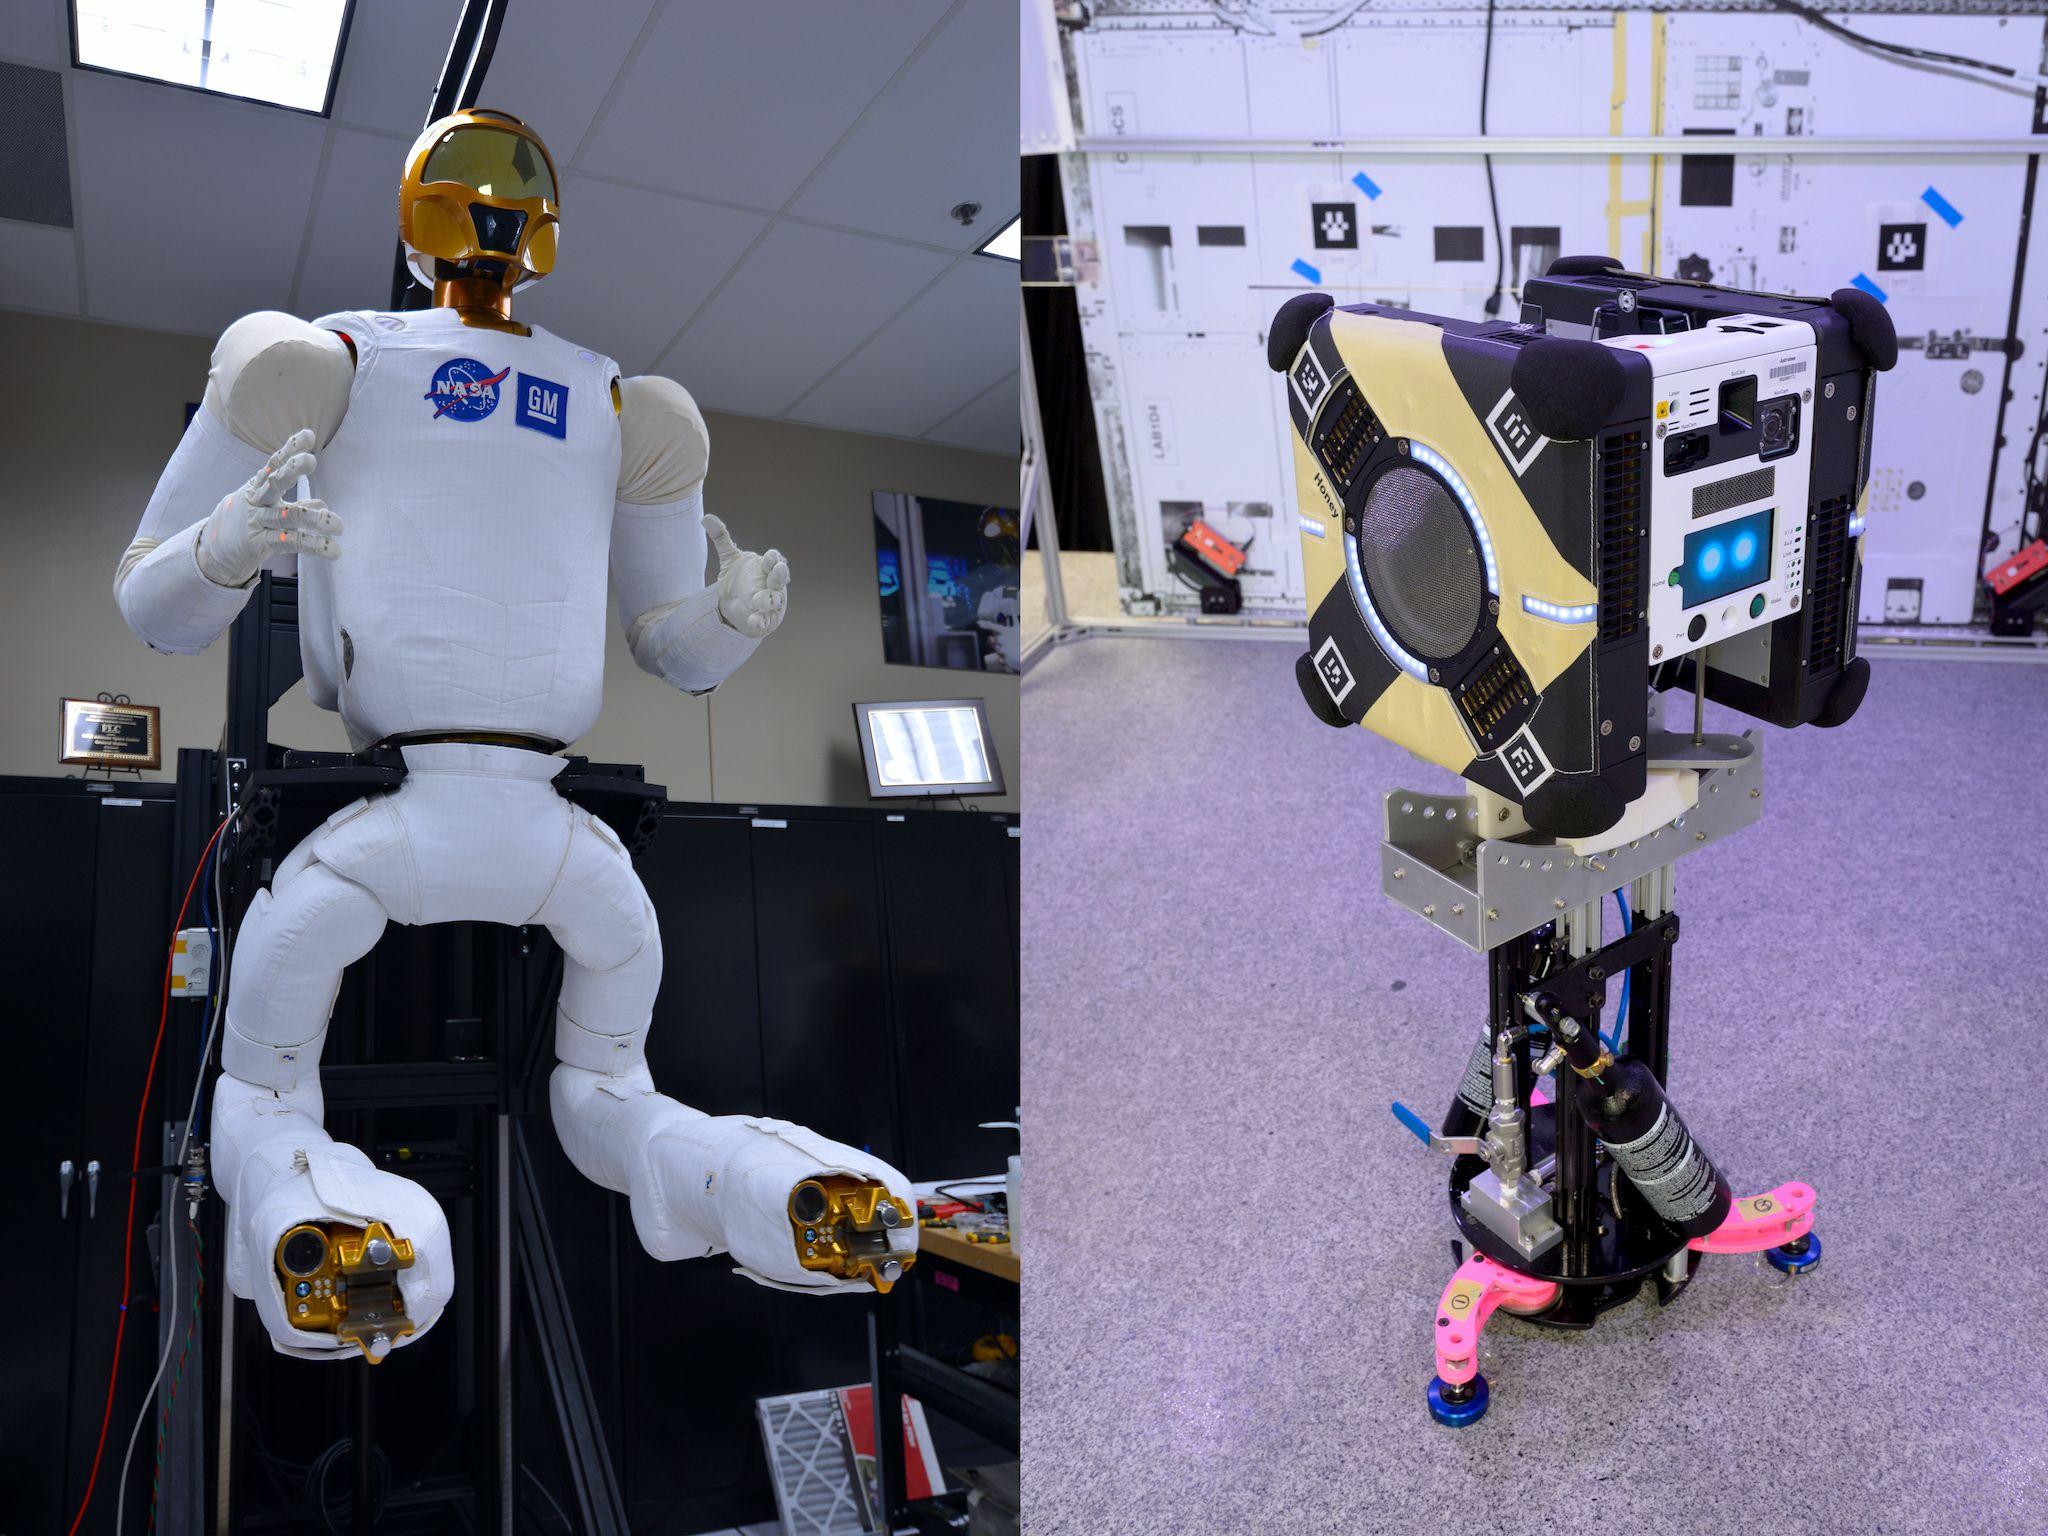 Robonaut and Astrobee